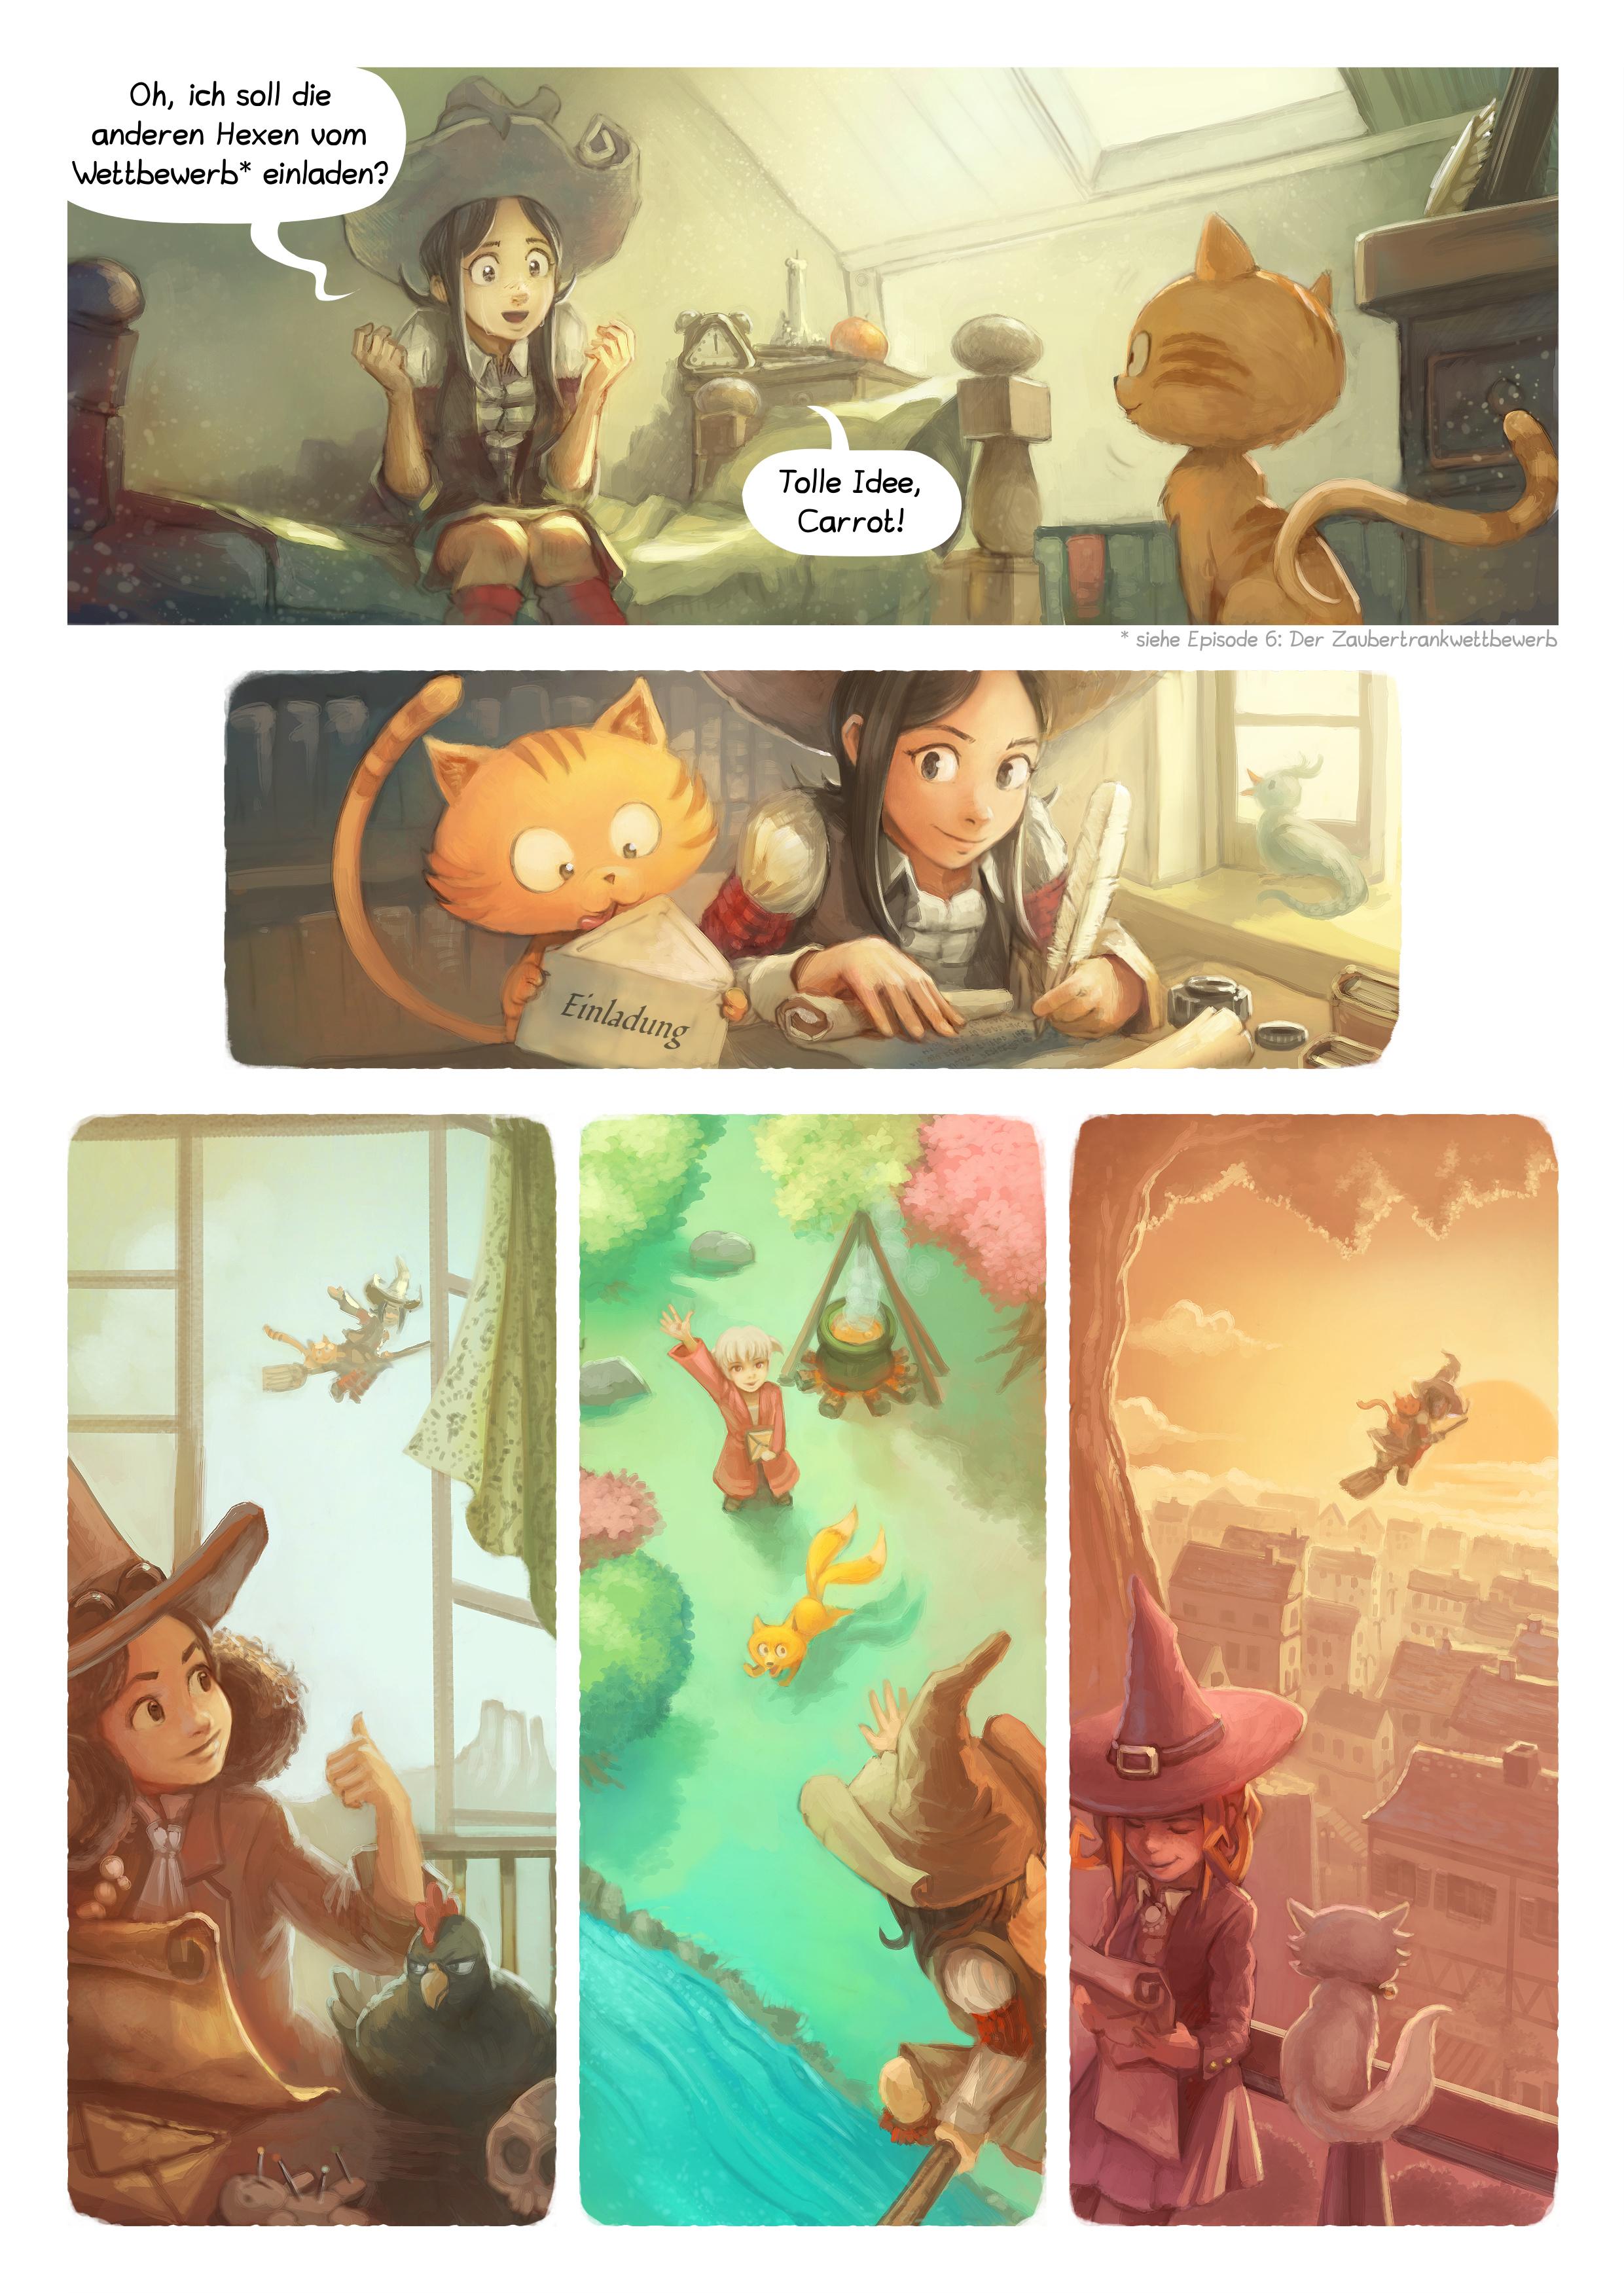 A webcomic page of Pepper&Carrot, Episode 8 [de], Seite 2